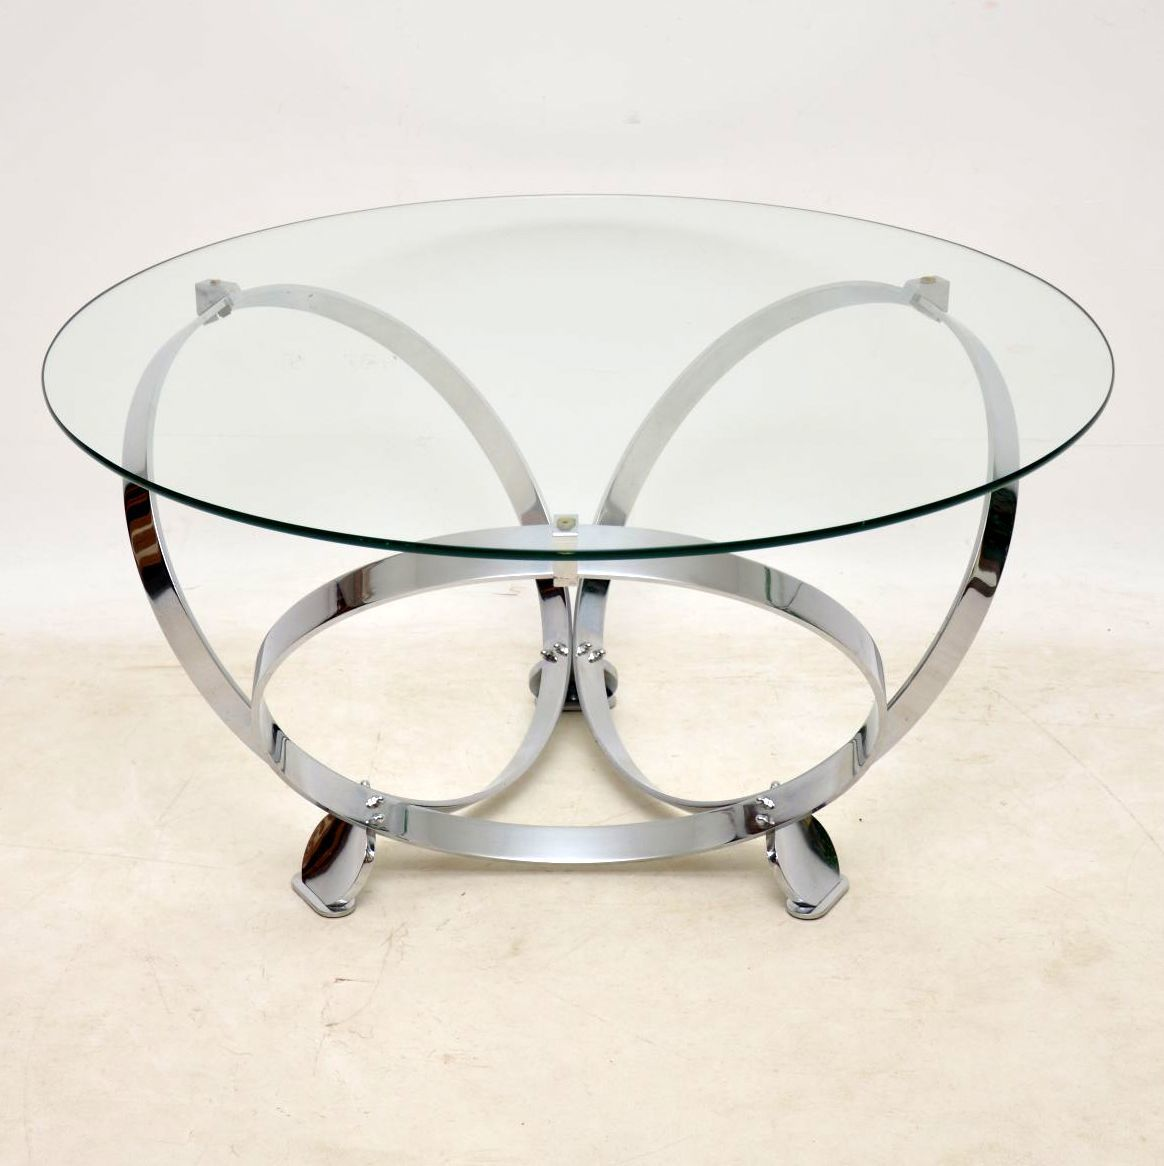 1970 S Chrome Glass Coffee Table By Knut Hesterberg Mobilya [ 1166 x 1164 Pixel ]